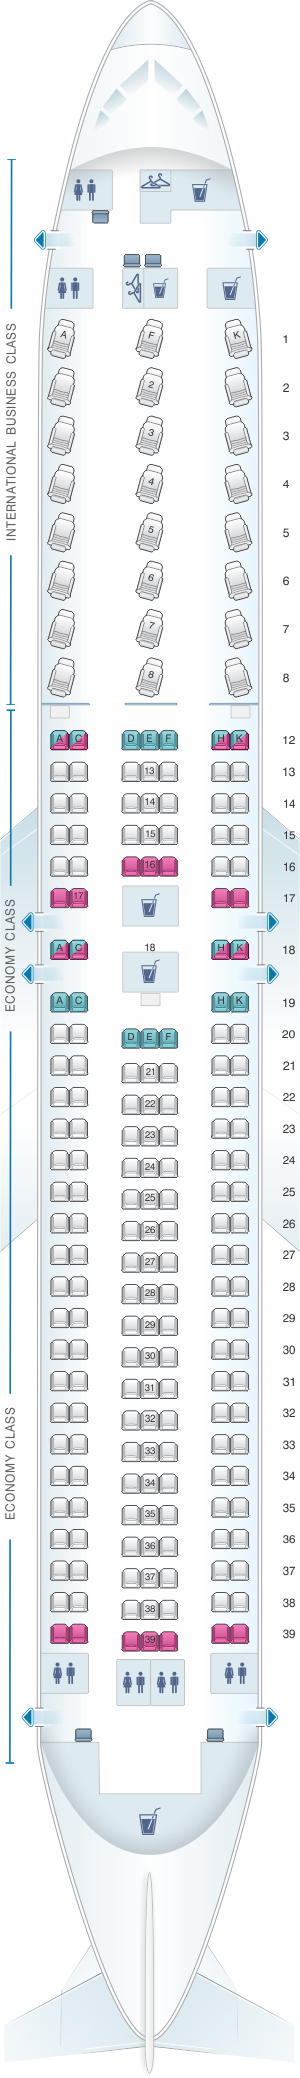 Seat map air canada boeing  er also airplane rh pinterest